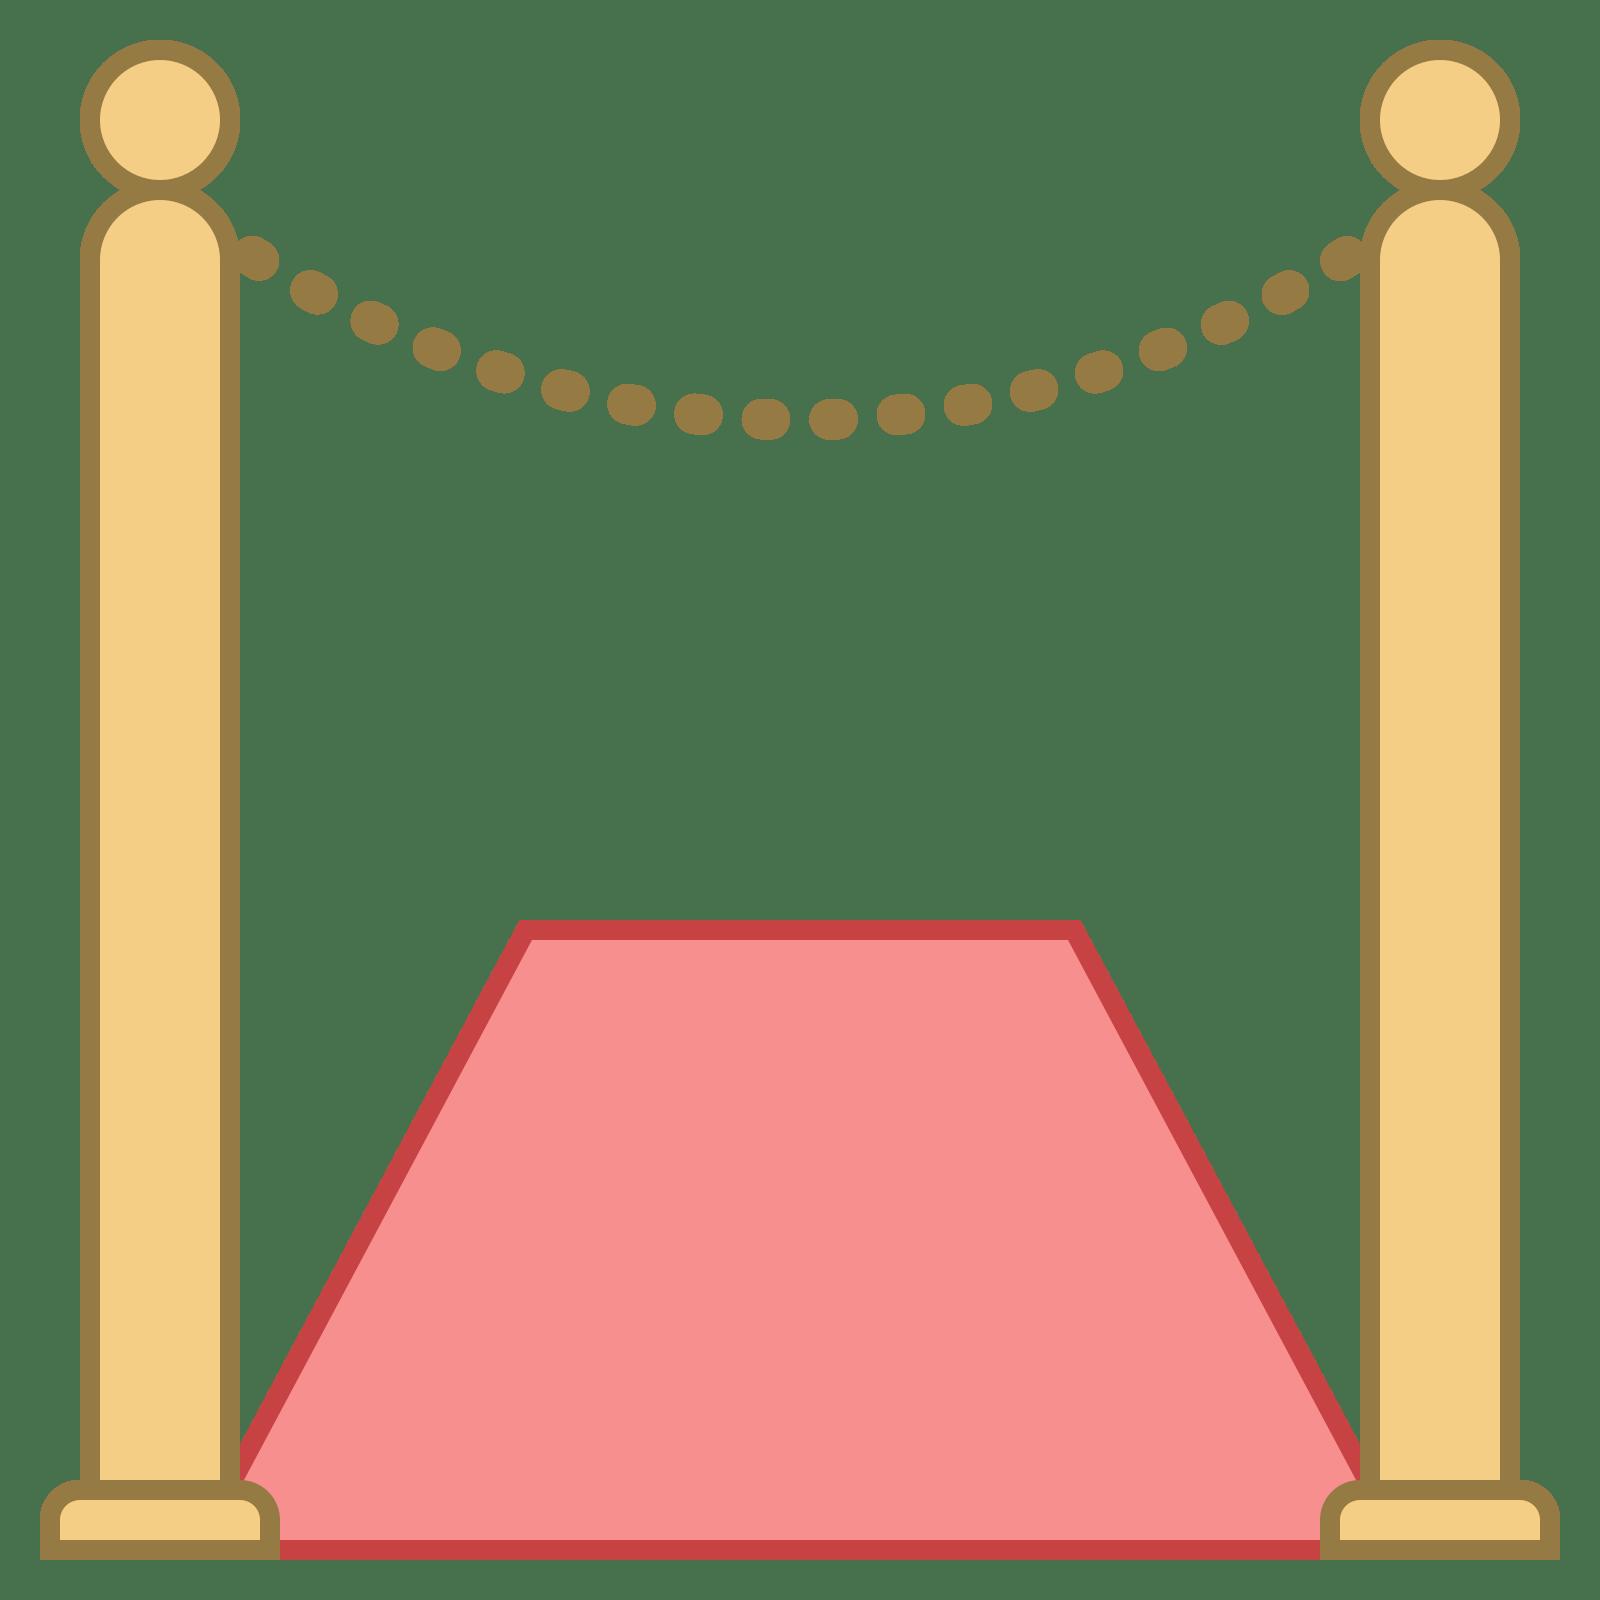 Free Red Download Carpet SVG